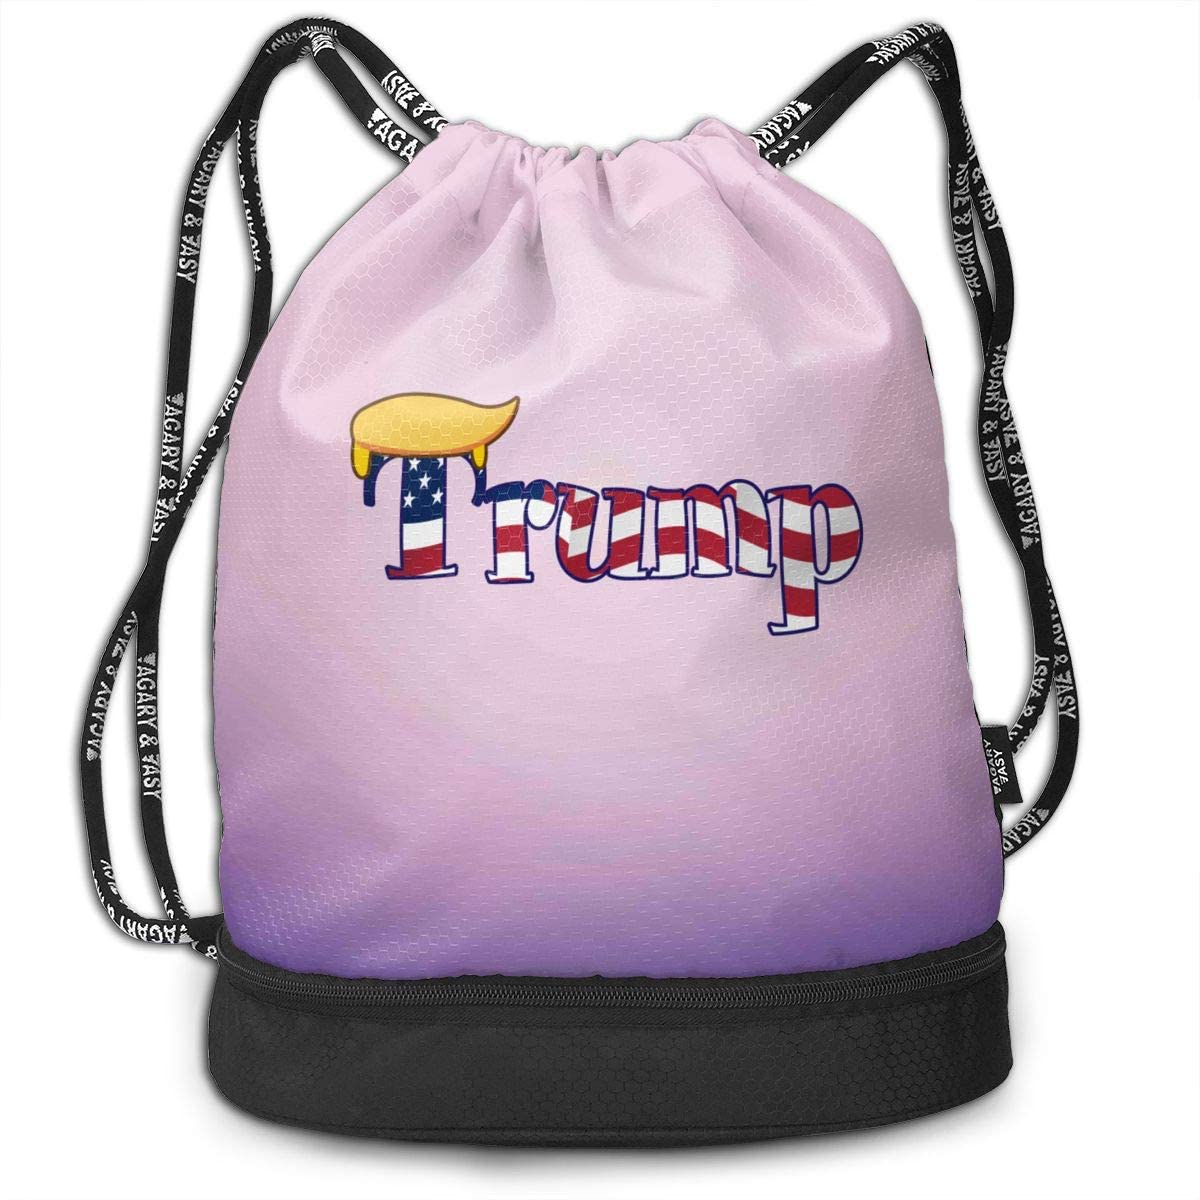 Sport Swimming Yoga Drawstring Backpack,Trump Yellow Hair 1 Patriotic Shoulder School Bag Lightweight for Students Teens Boy Girl Travel Camping